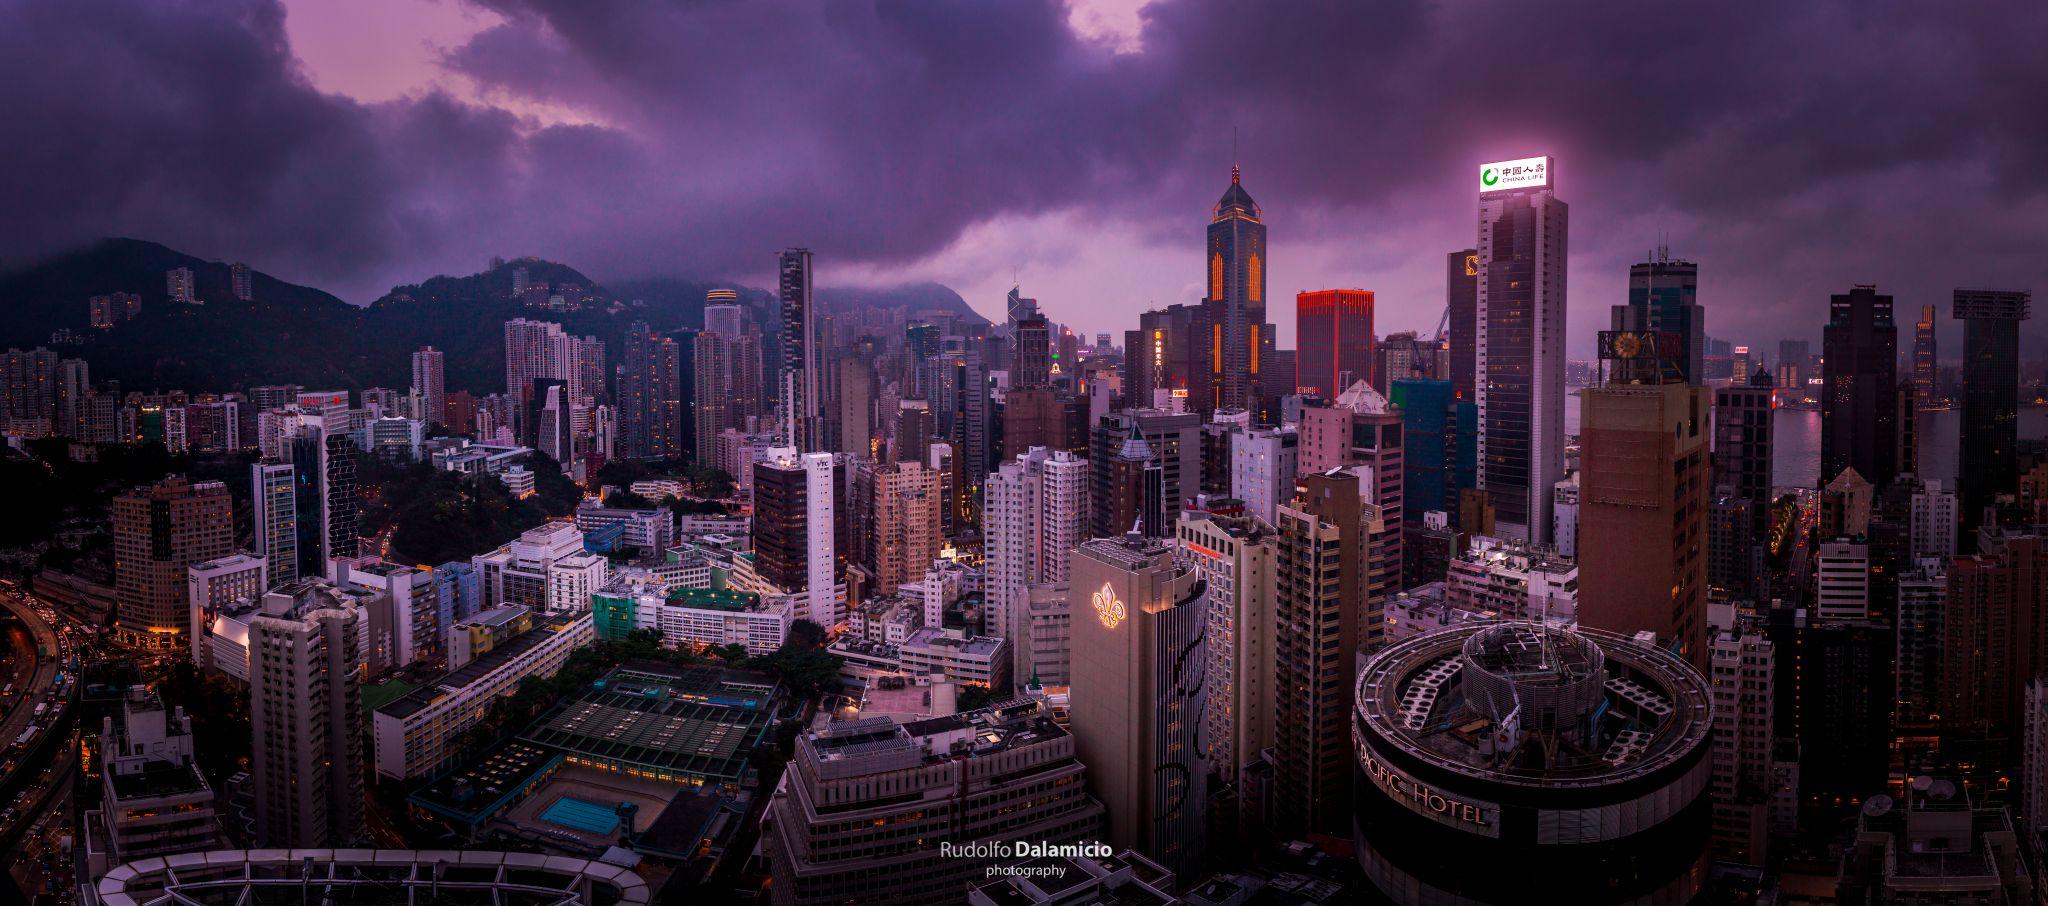 I live in Hong Kong, Hong Kong